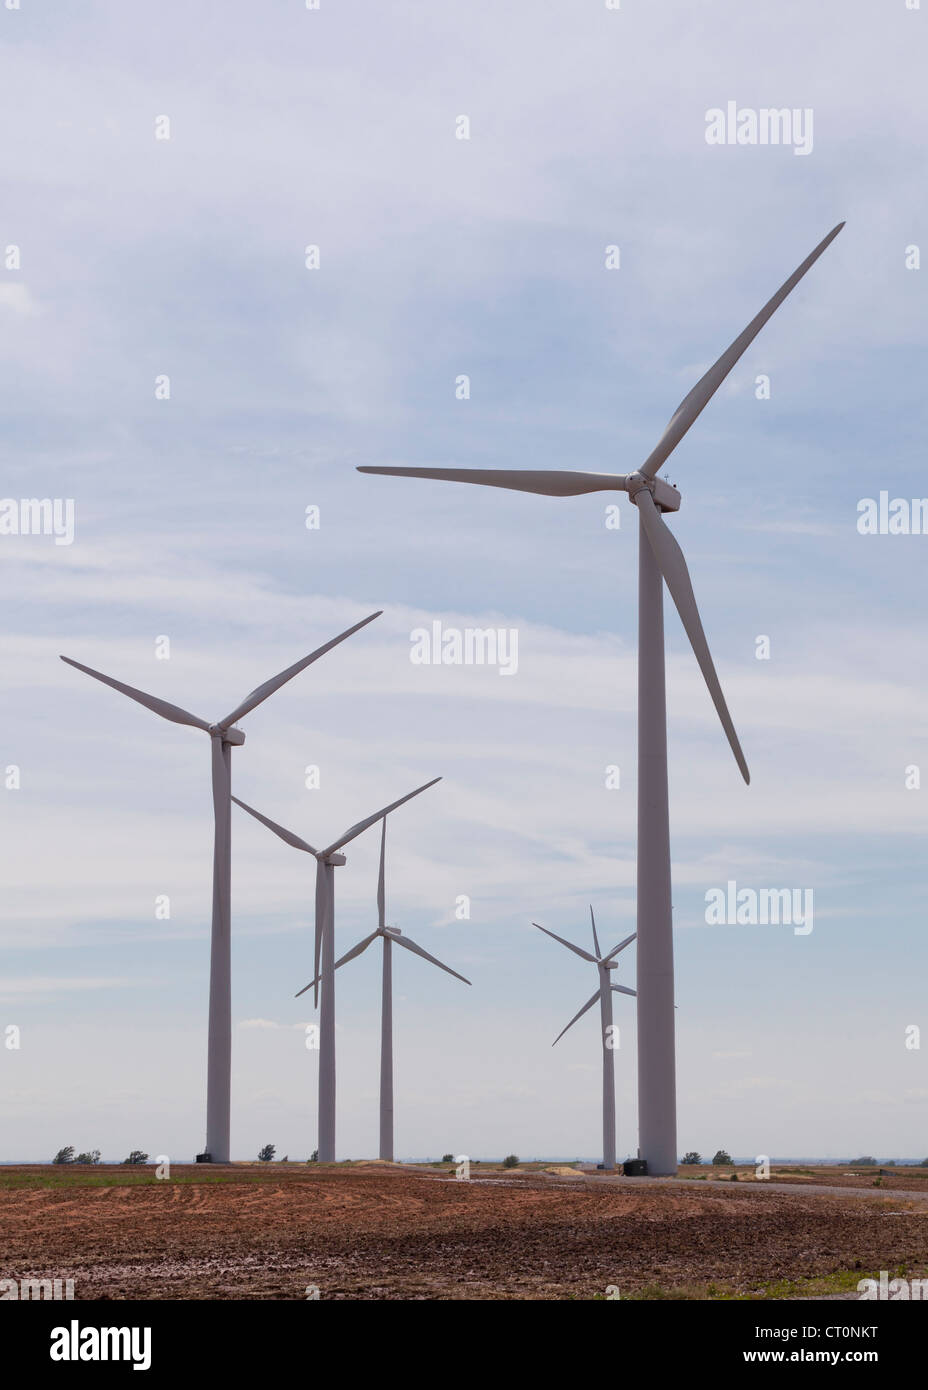 Wind turbines - Texas, USA - Stock Image